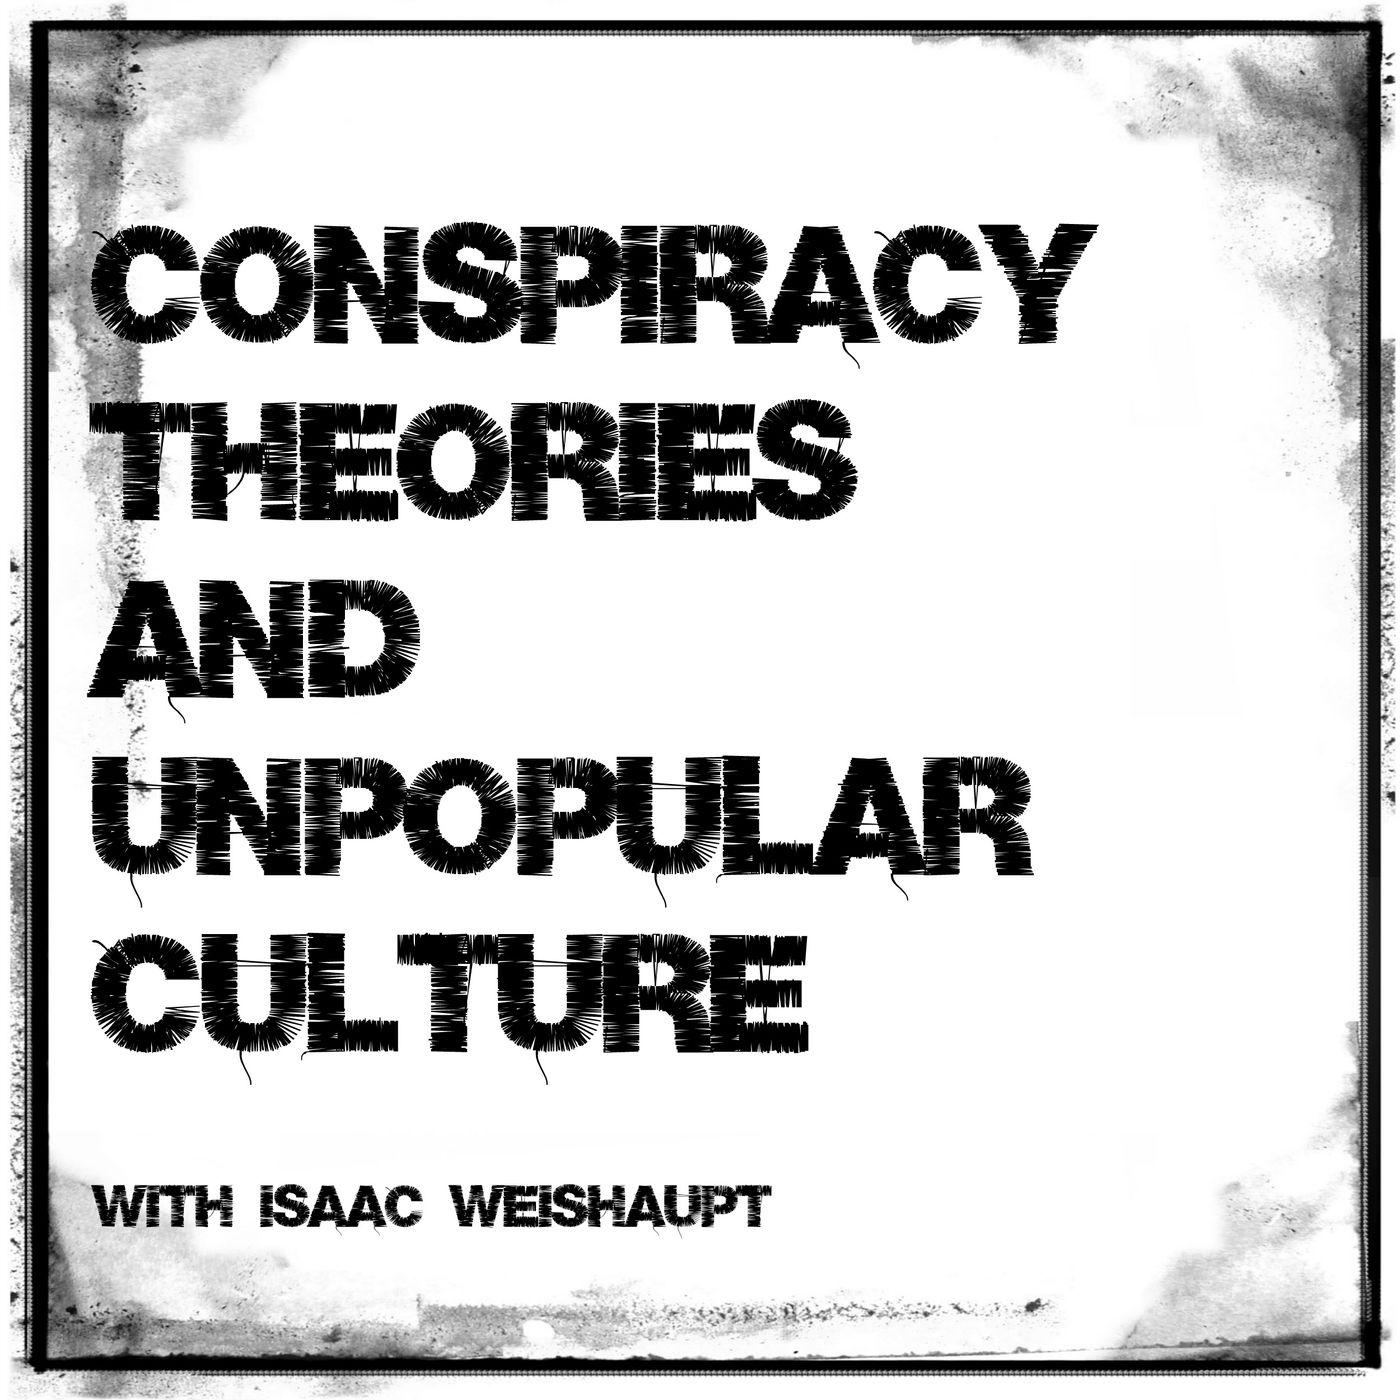 Coronavirus Conspiracies 3: Fake News vs Science Nerds, Digital Currency, Disease X & Politics!